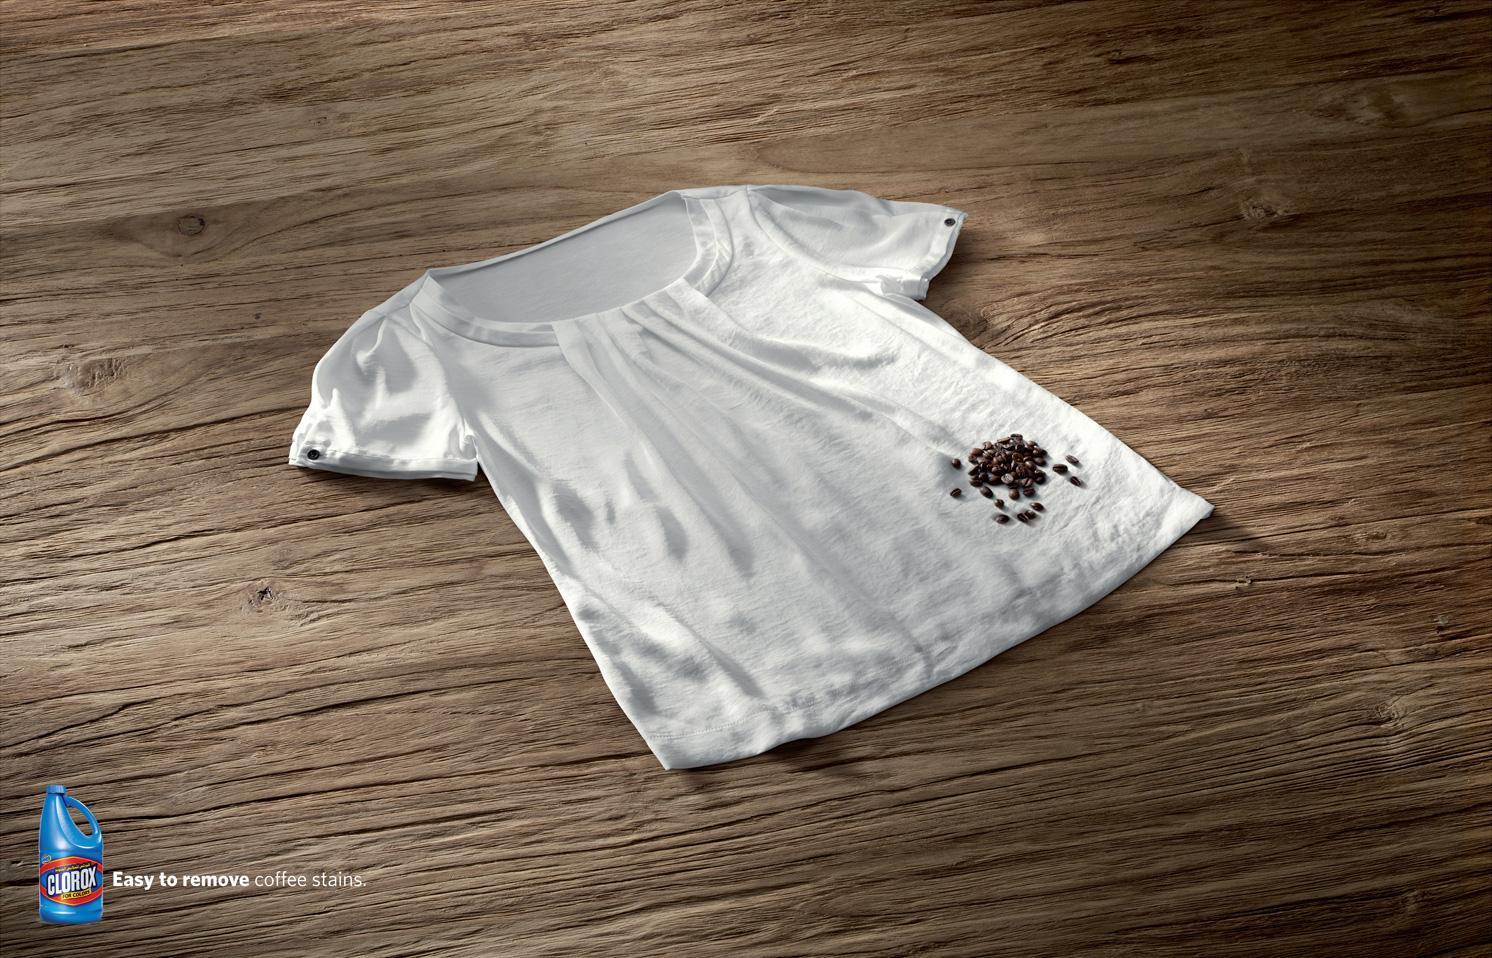 Clorox Print Ad -  Coffee beans